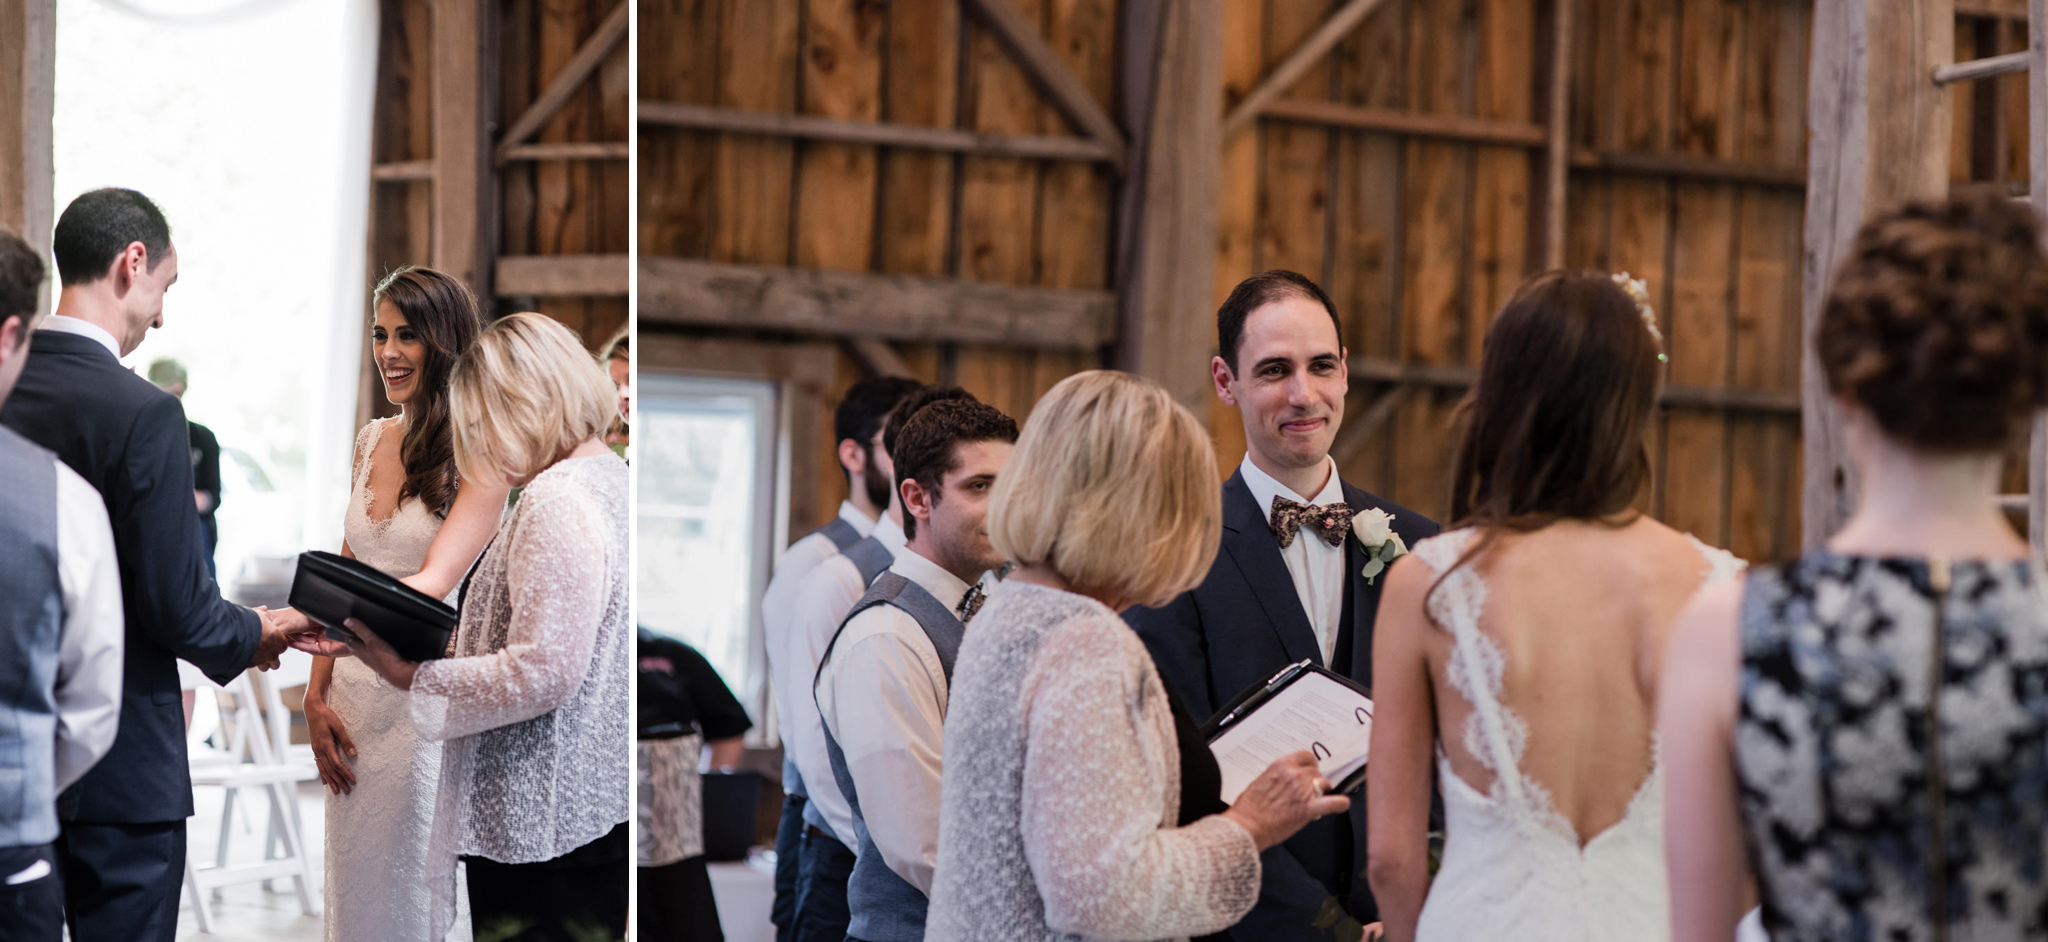 125-wedding-ceremony-in-the-rain-toronto-photographer.jpg